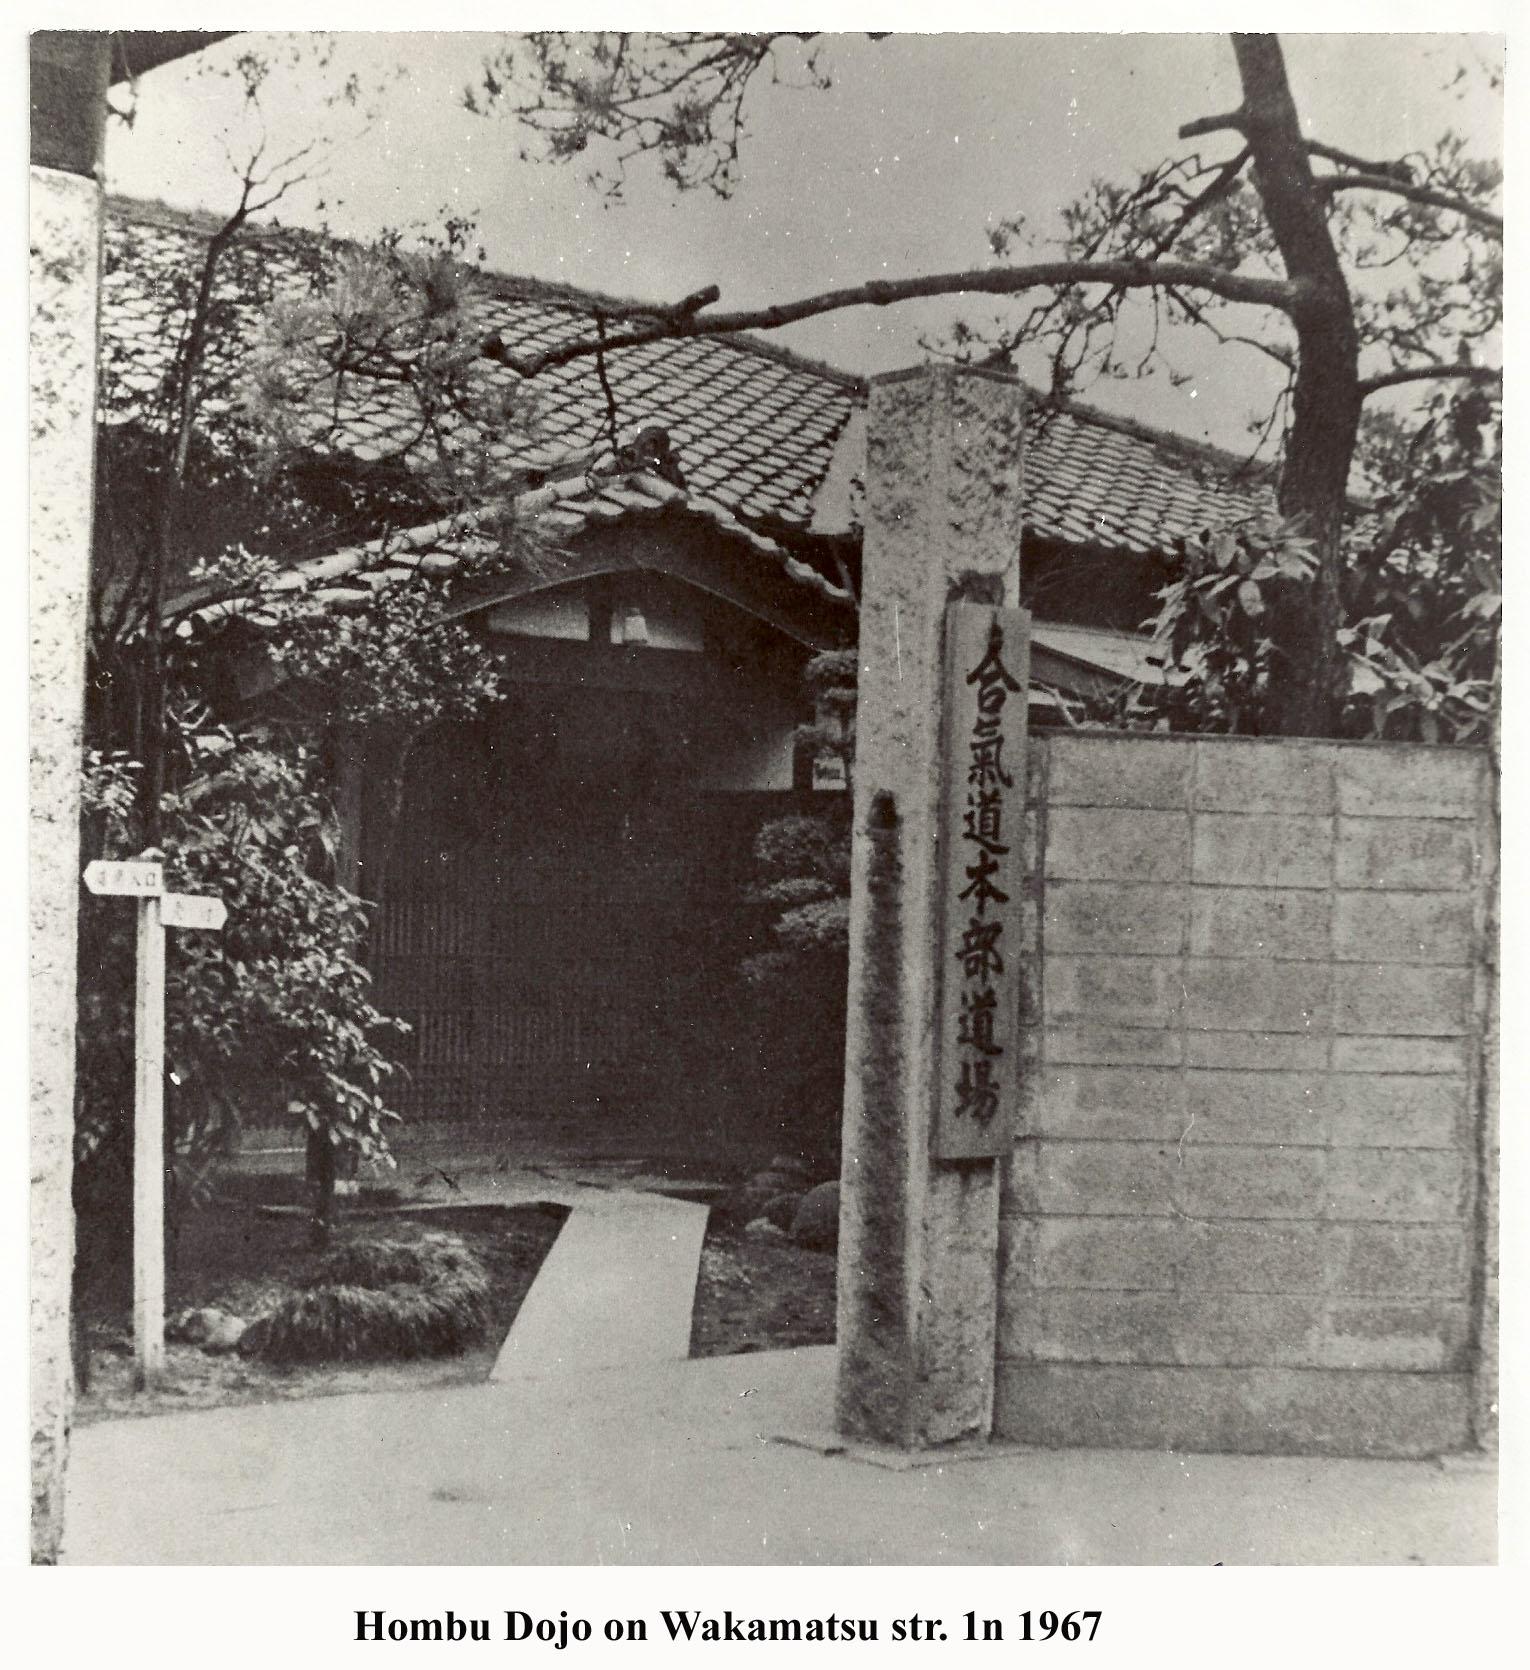 How Hombu Dojo looked when Sensei von Krenner trained there.